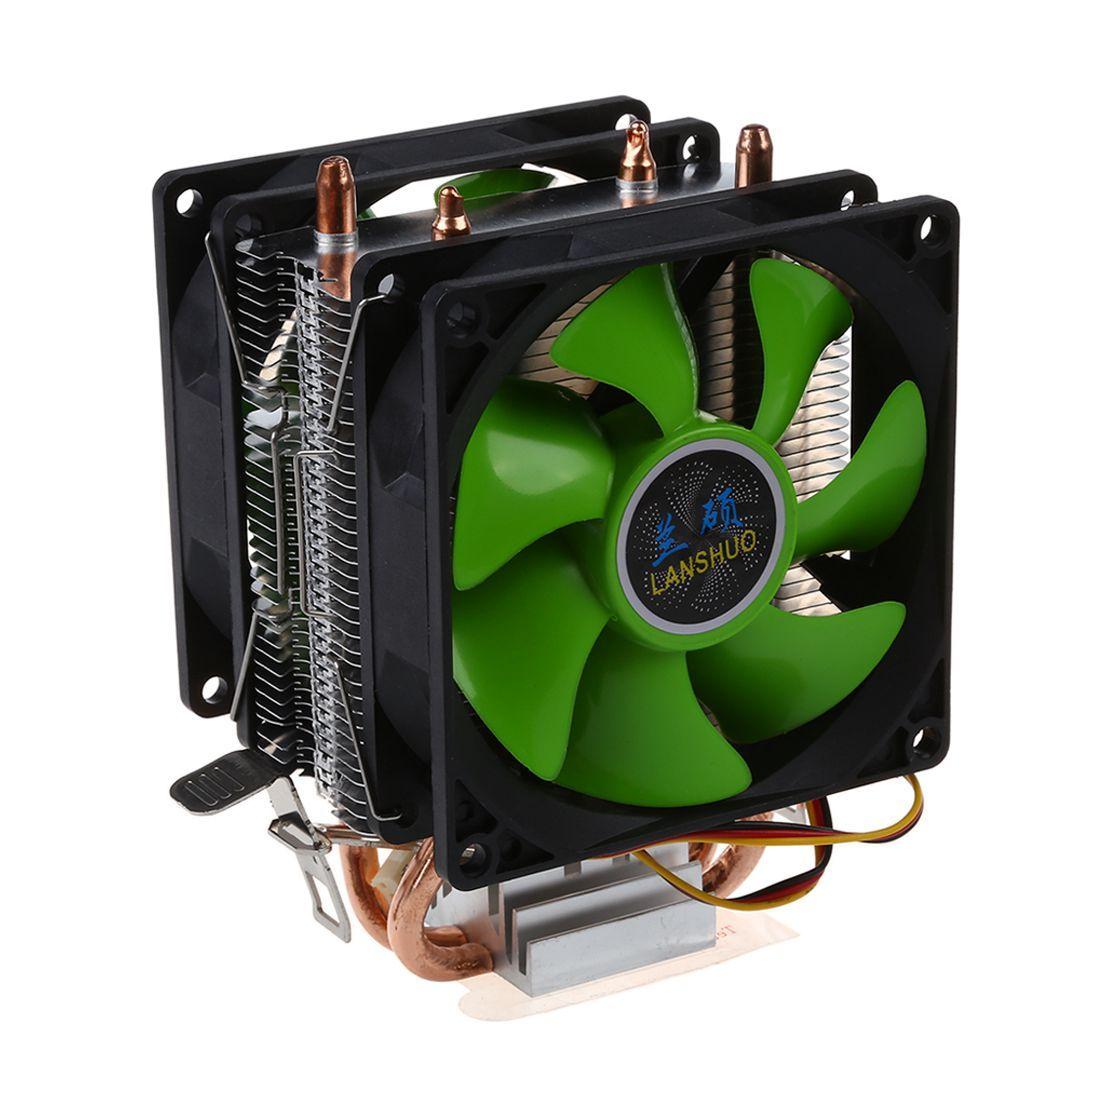 CPU kühler Silent Fan Für Intel LGA775/1156/1155 AMD AM2/AM2 +/AM3